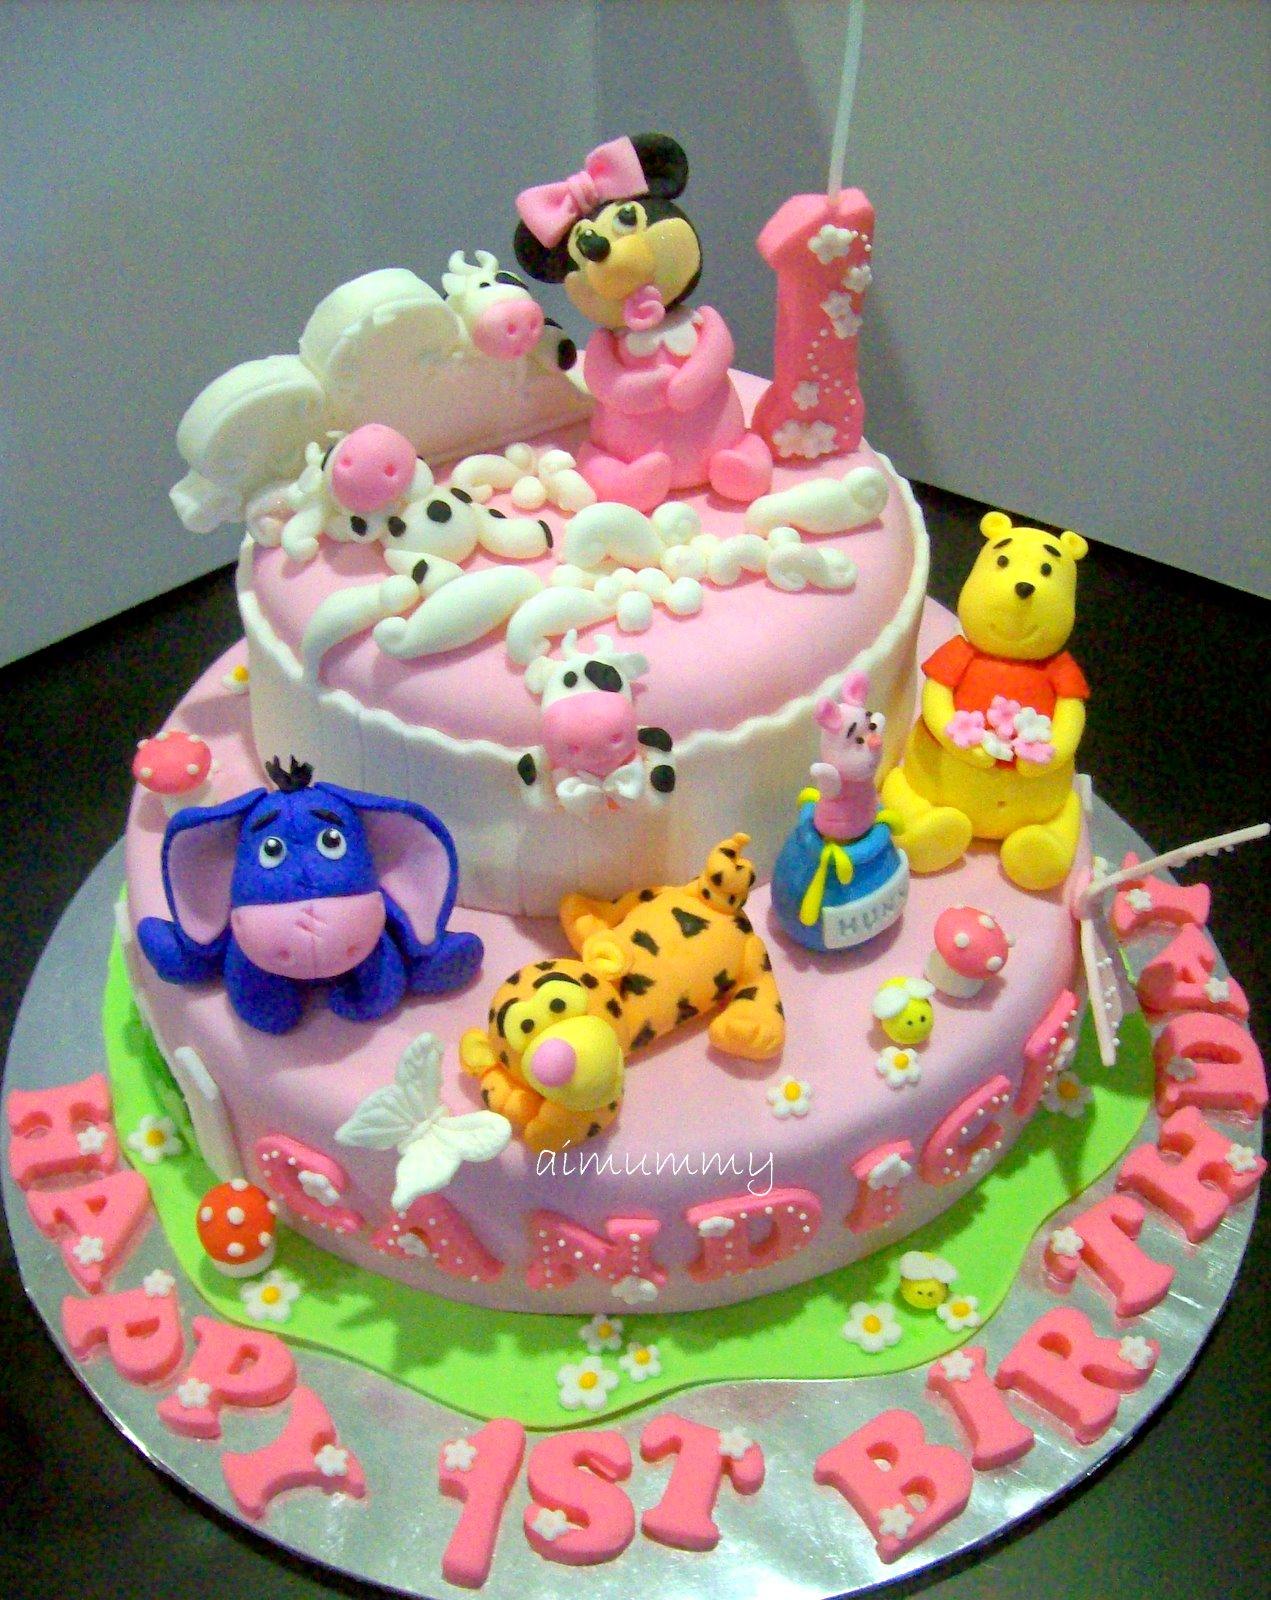 6 Girls Birthday Fancy Cakes Photo Fancy Nancy Birthday Party Cake